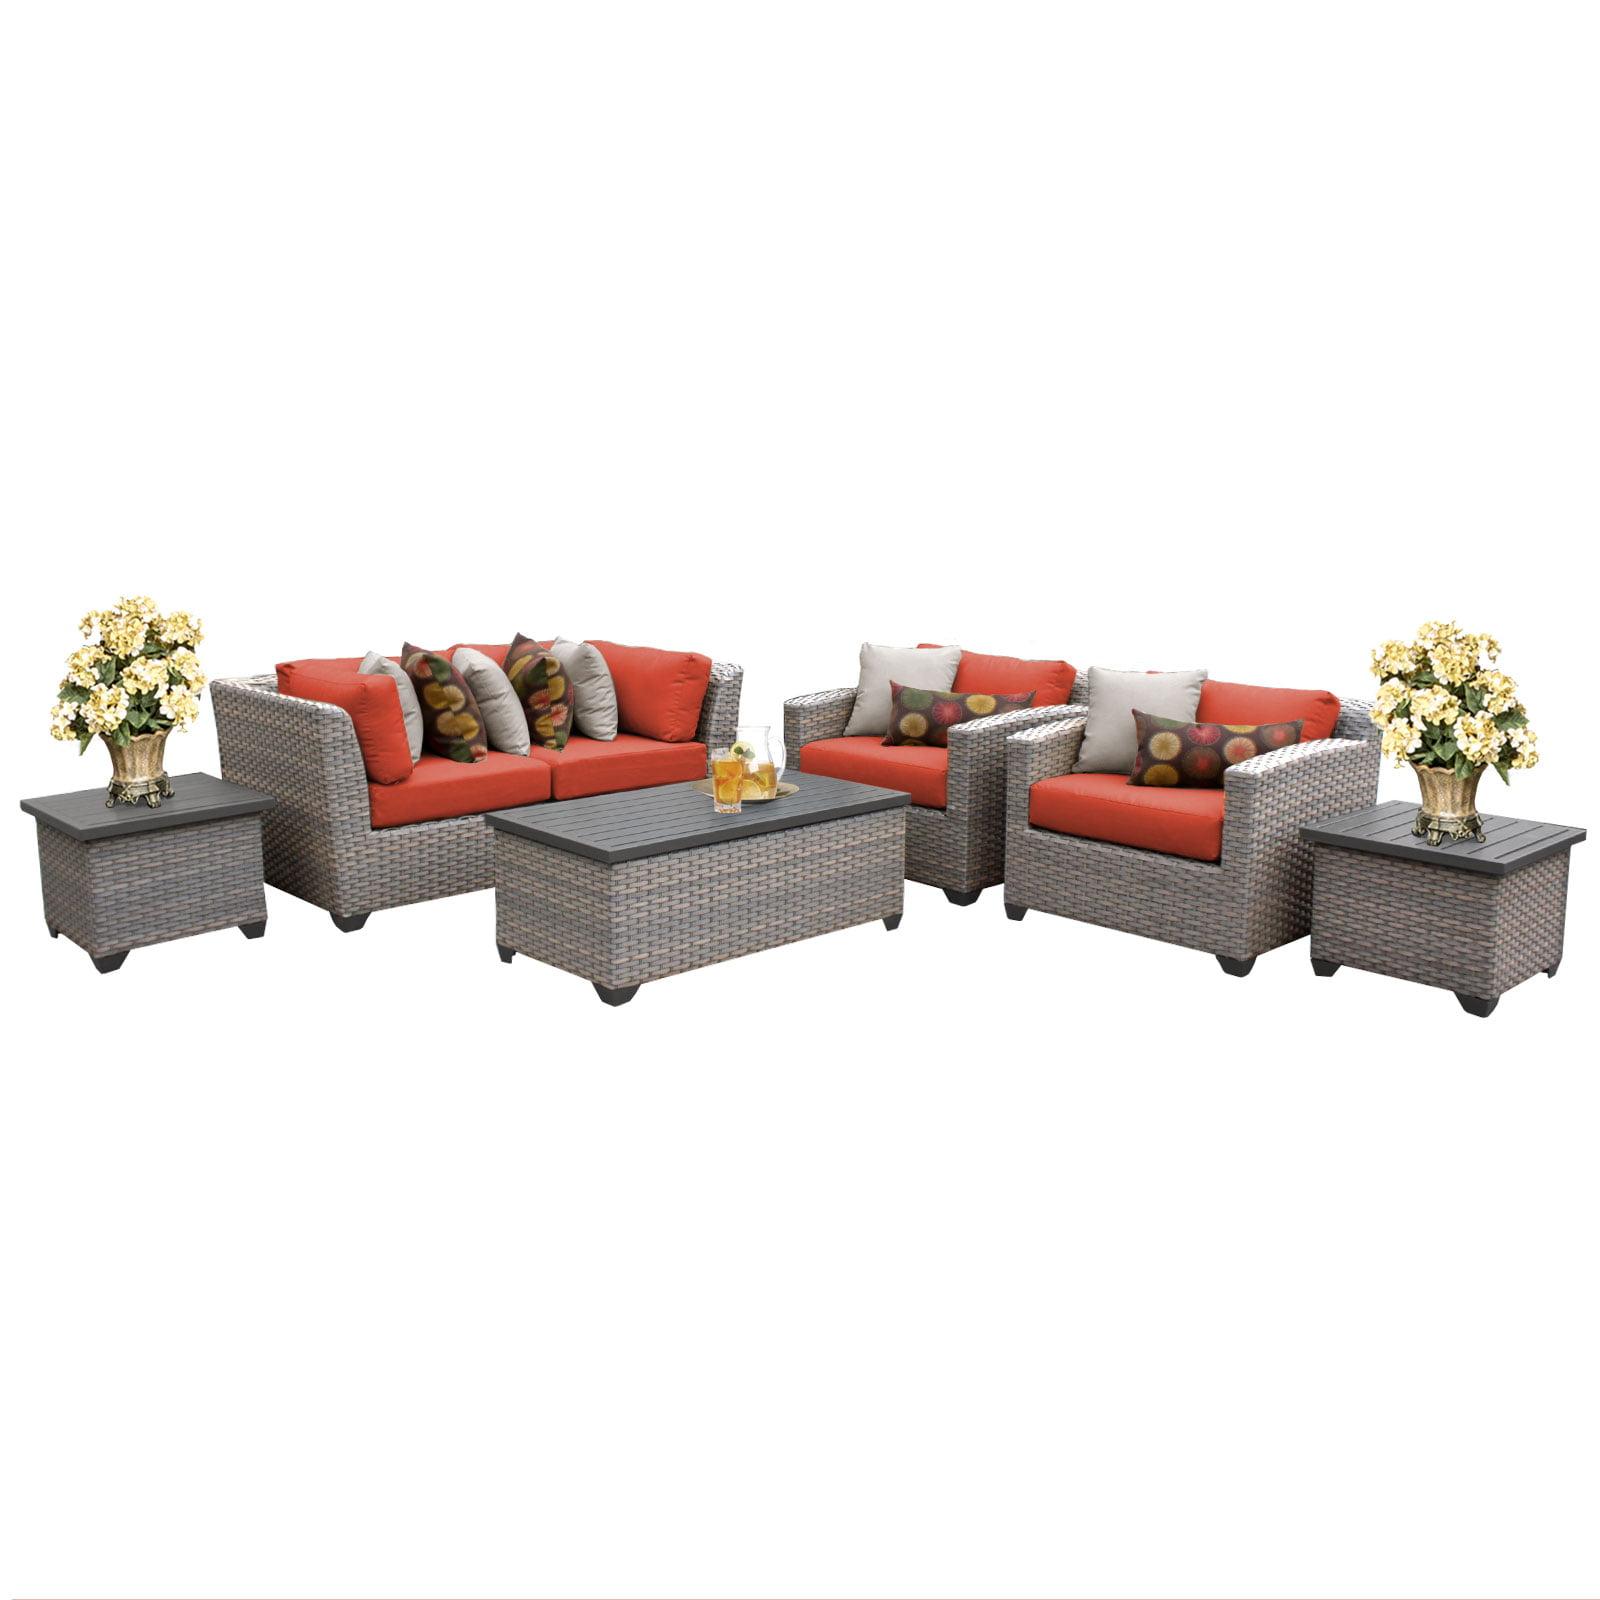 Catalina 7 Piece Outdoor Wicker Patio Furniture Set 07d